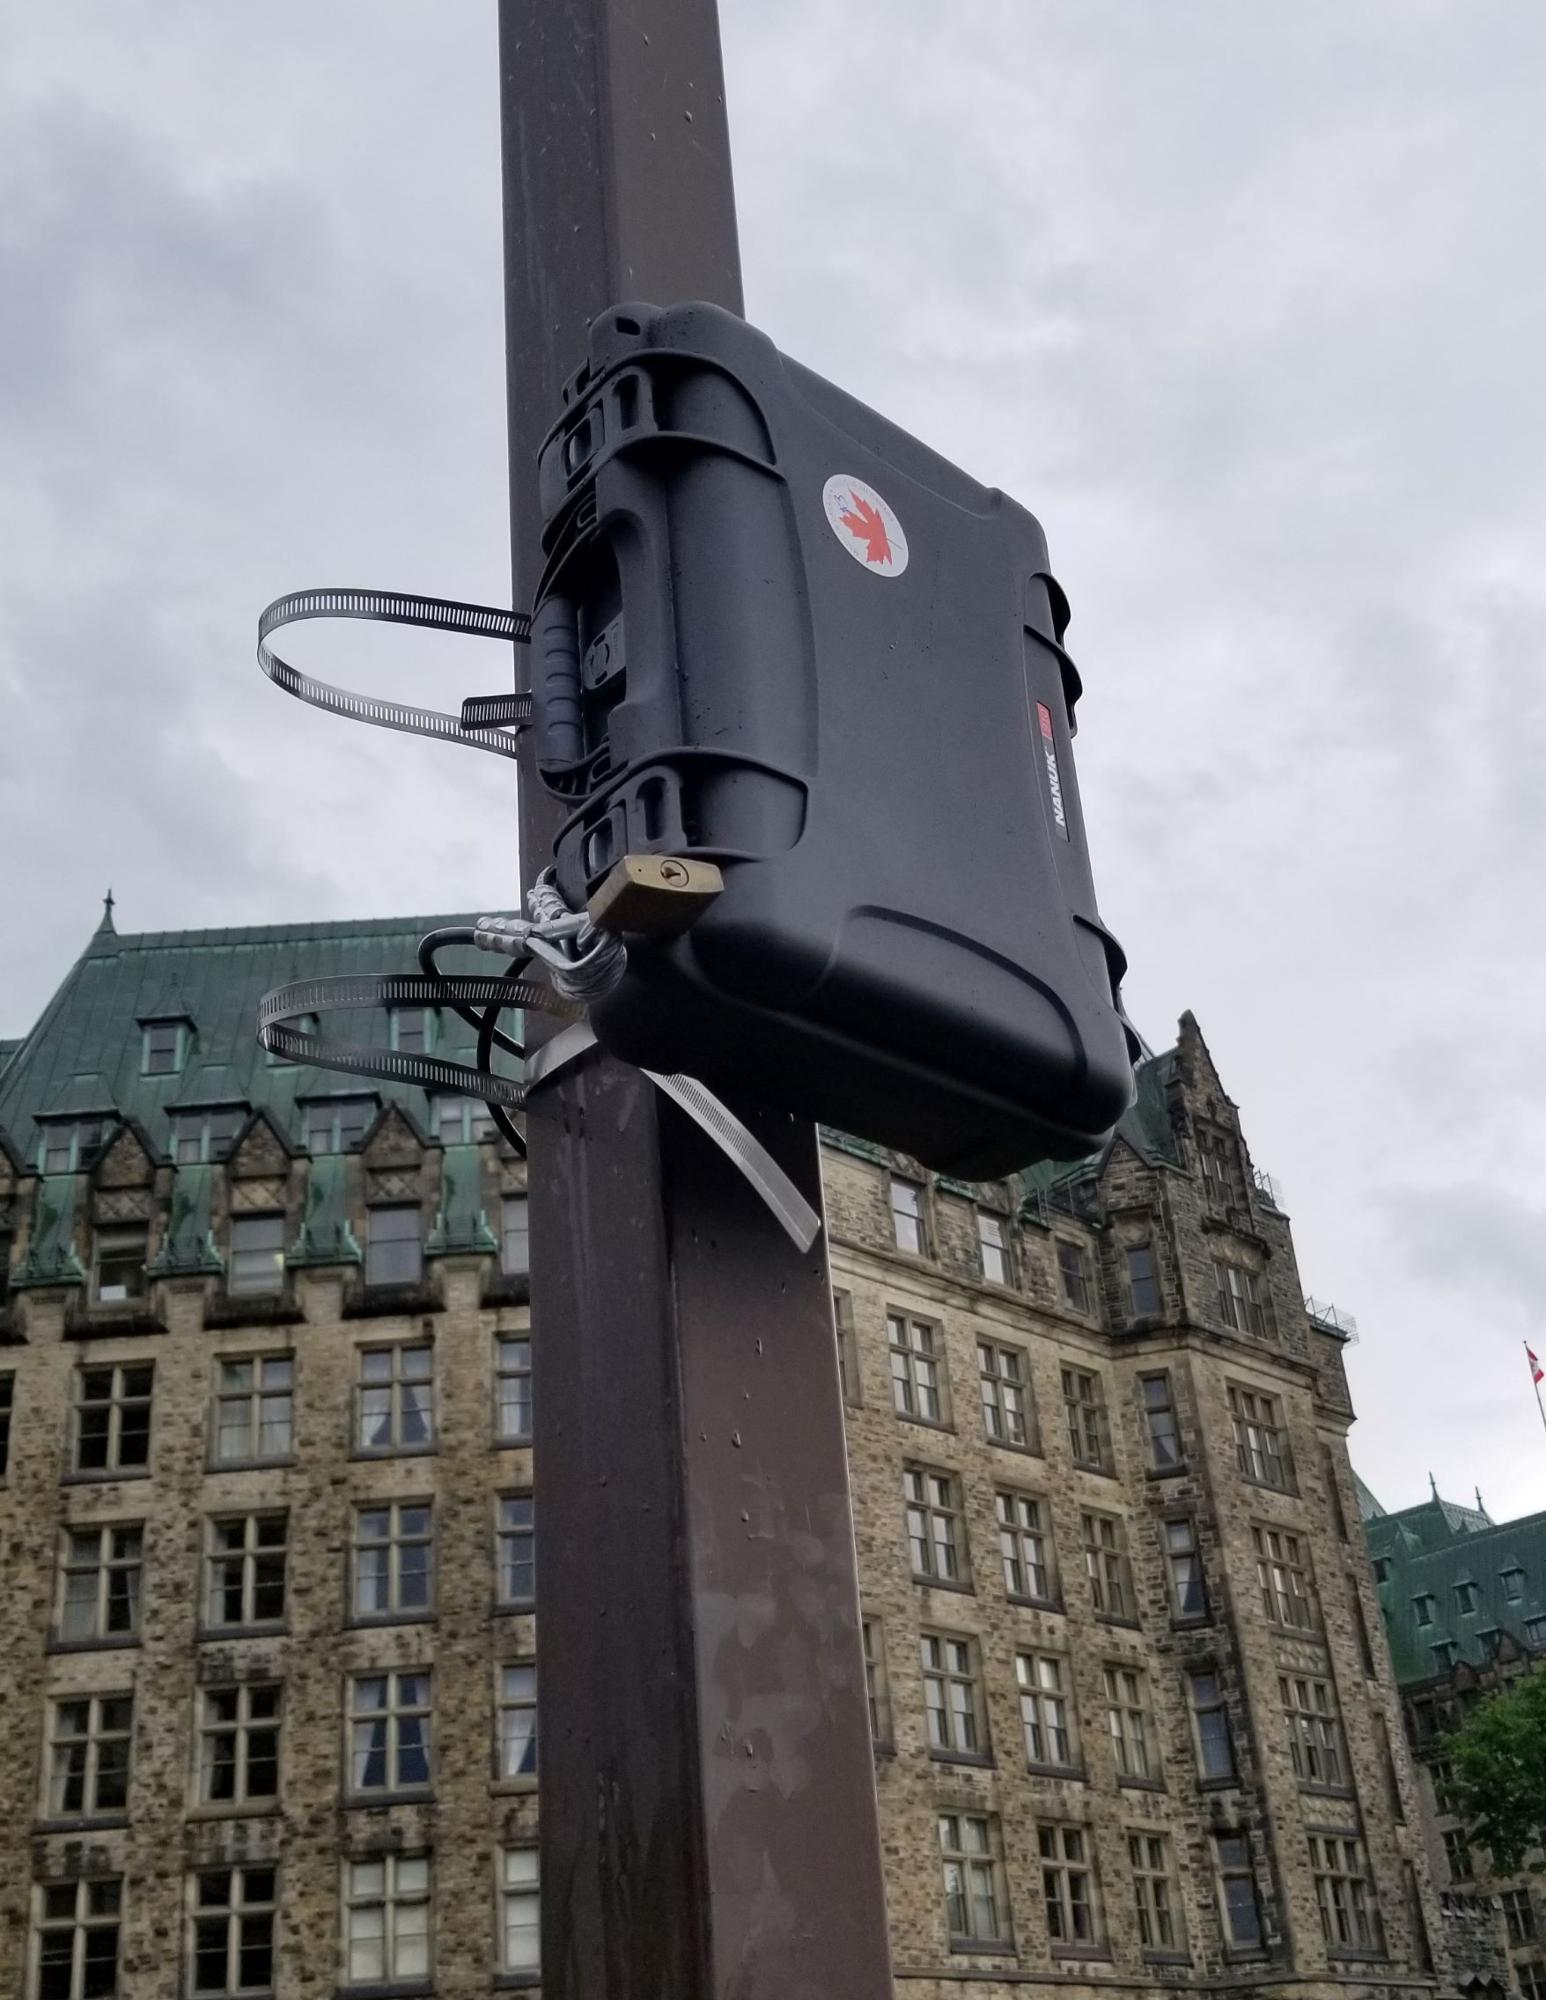 Sensor Deployed at Event